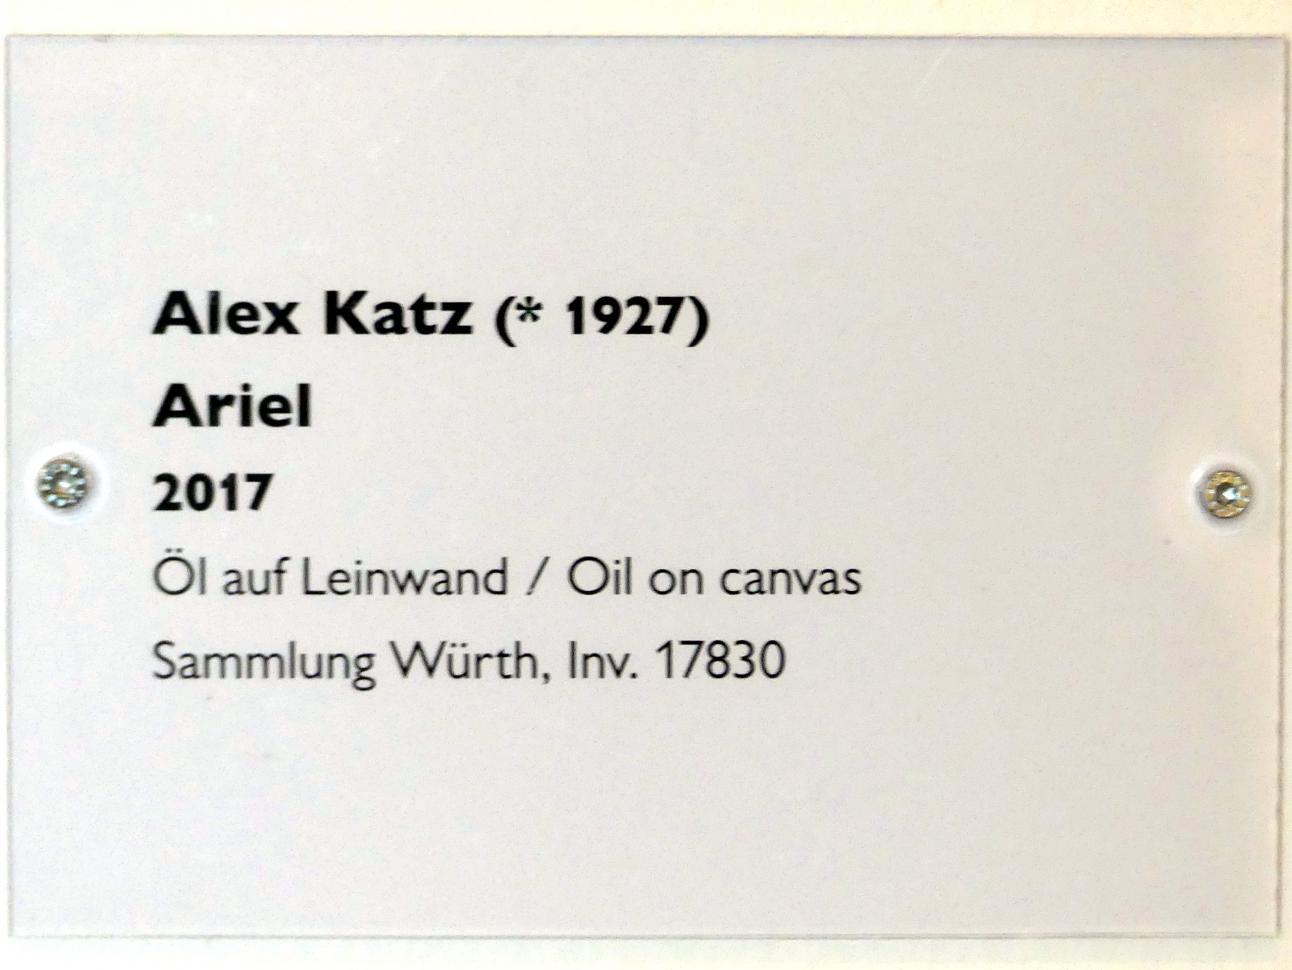 Alex Katz: Ariel, 2017, Bild 2/2